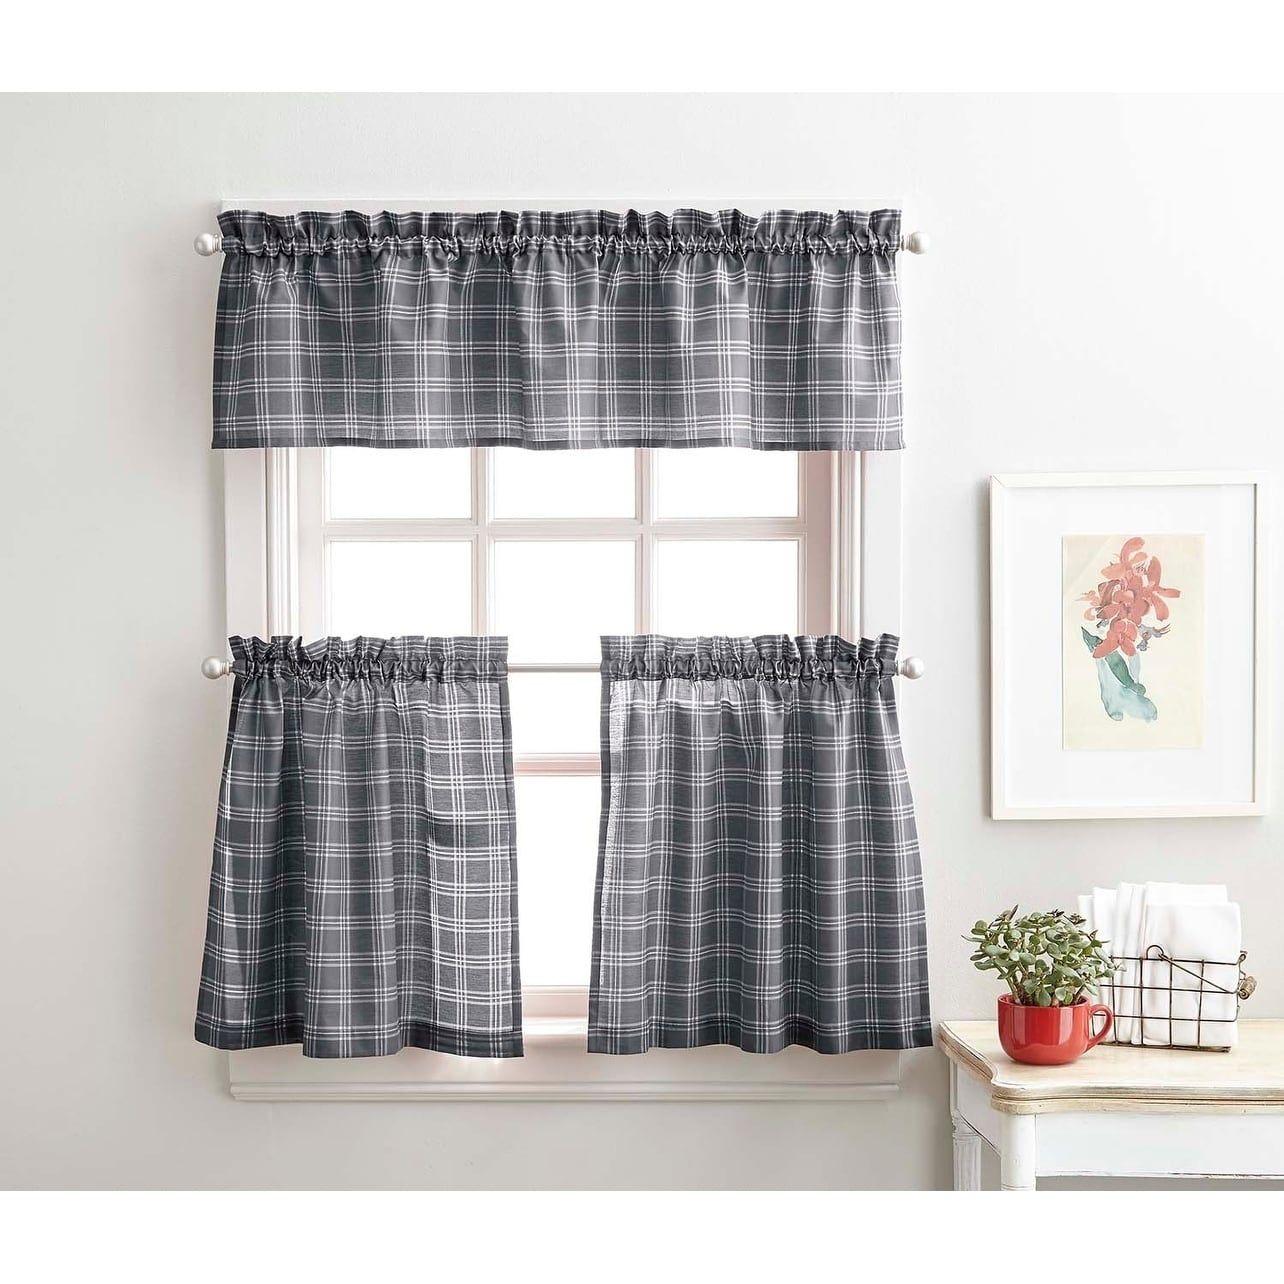 Lodge Plaid 3 Piece Kitchen Curtain Tier And Valance Set 36 3pc